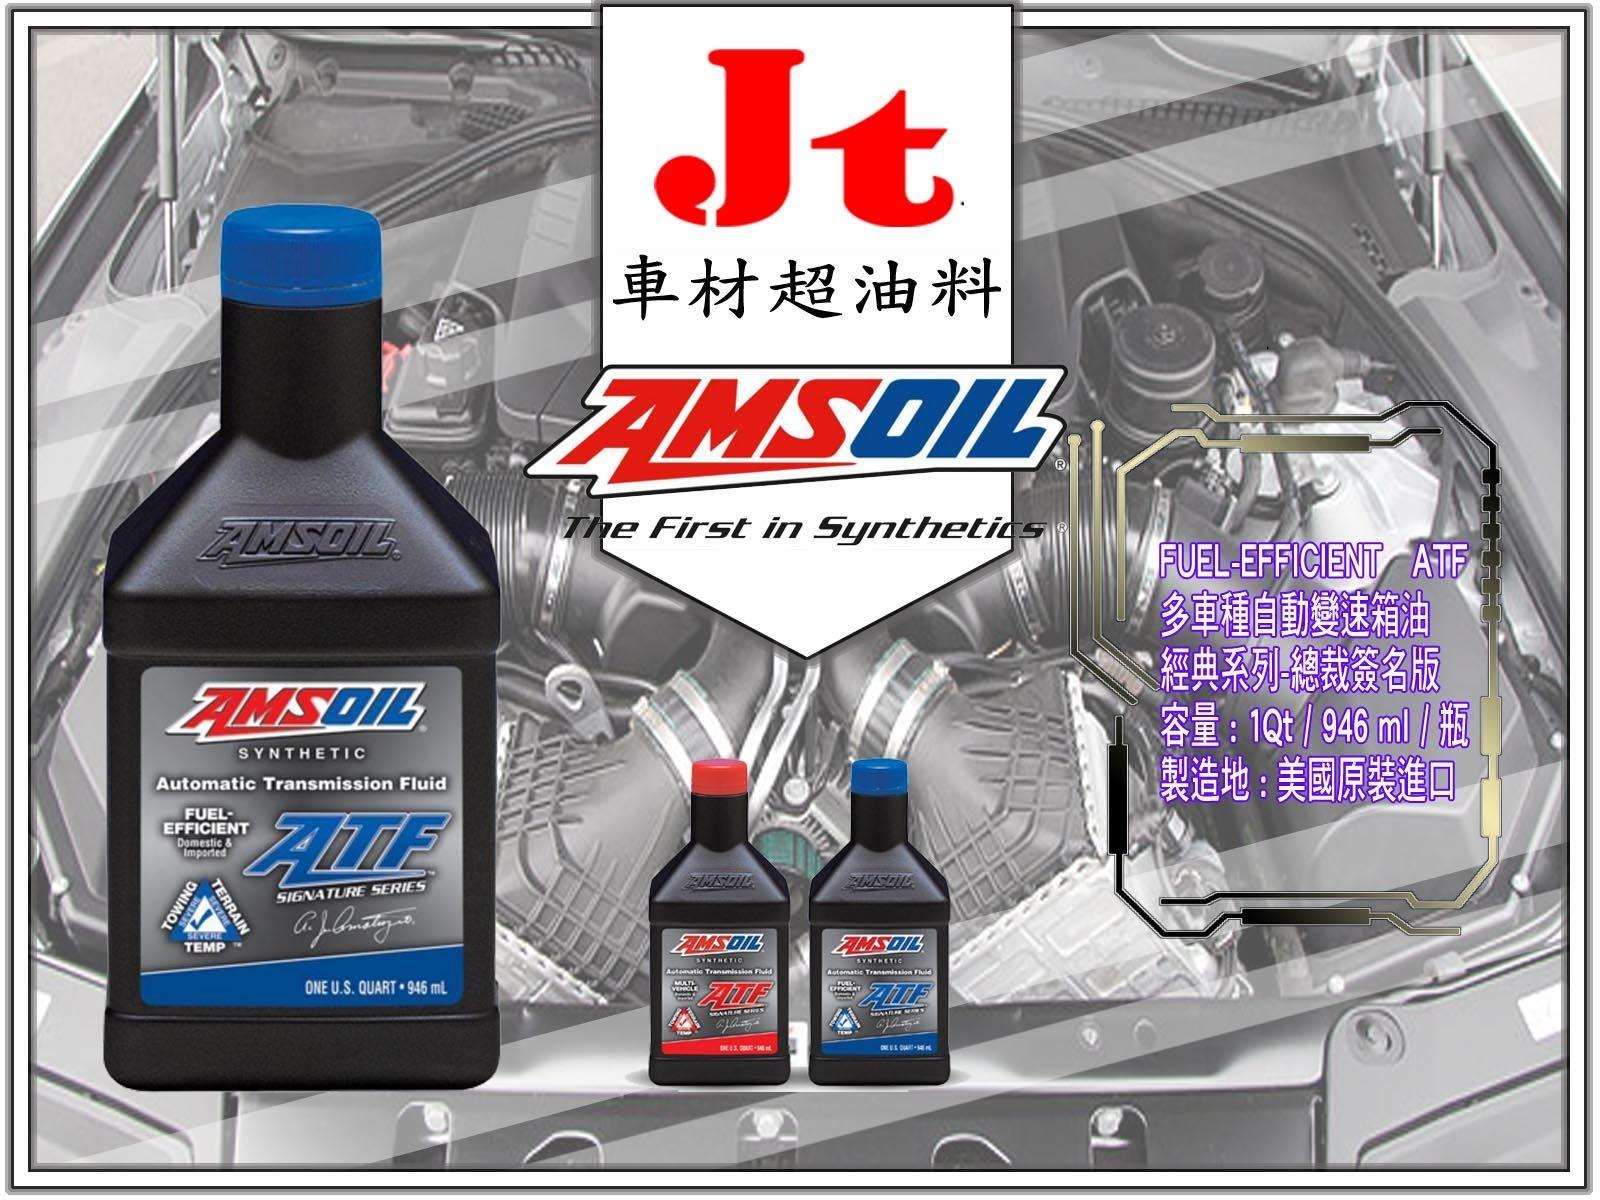 Jt車材 - AMSOIL (ATL) Fuel-Efficient 多車種全合成自動變速箱油  經典系列